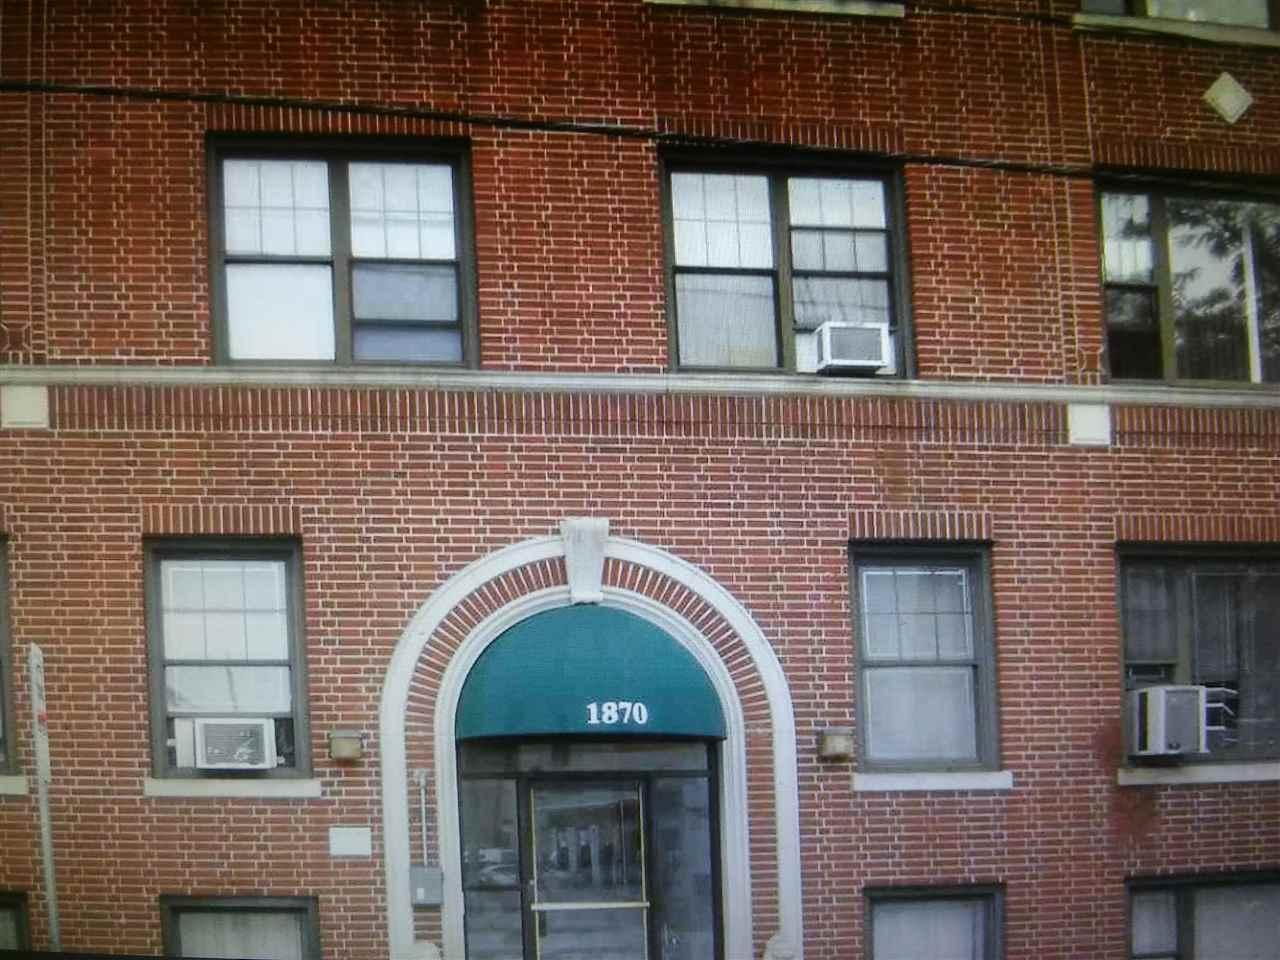 1870 KENNEDY BLVD 2A, JC, Greenville, NJ 07305